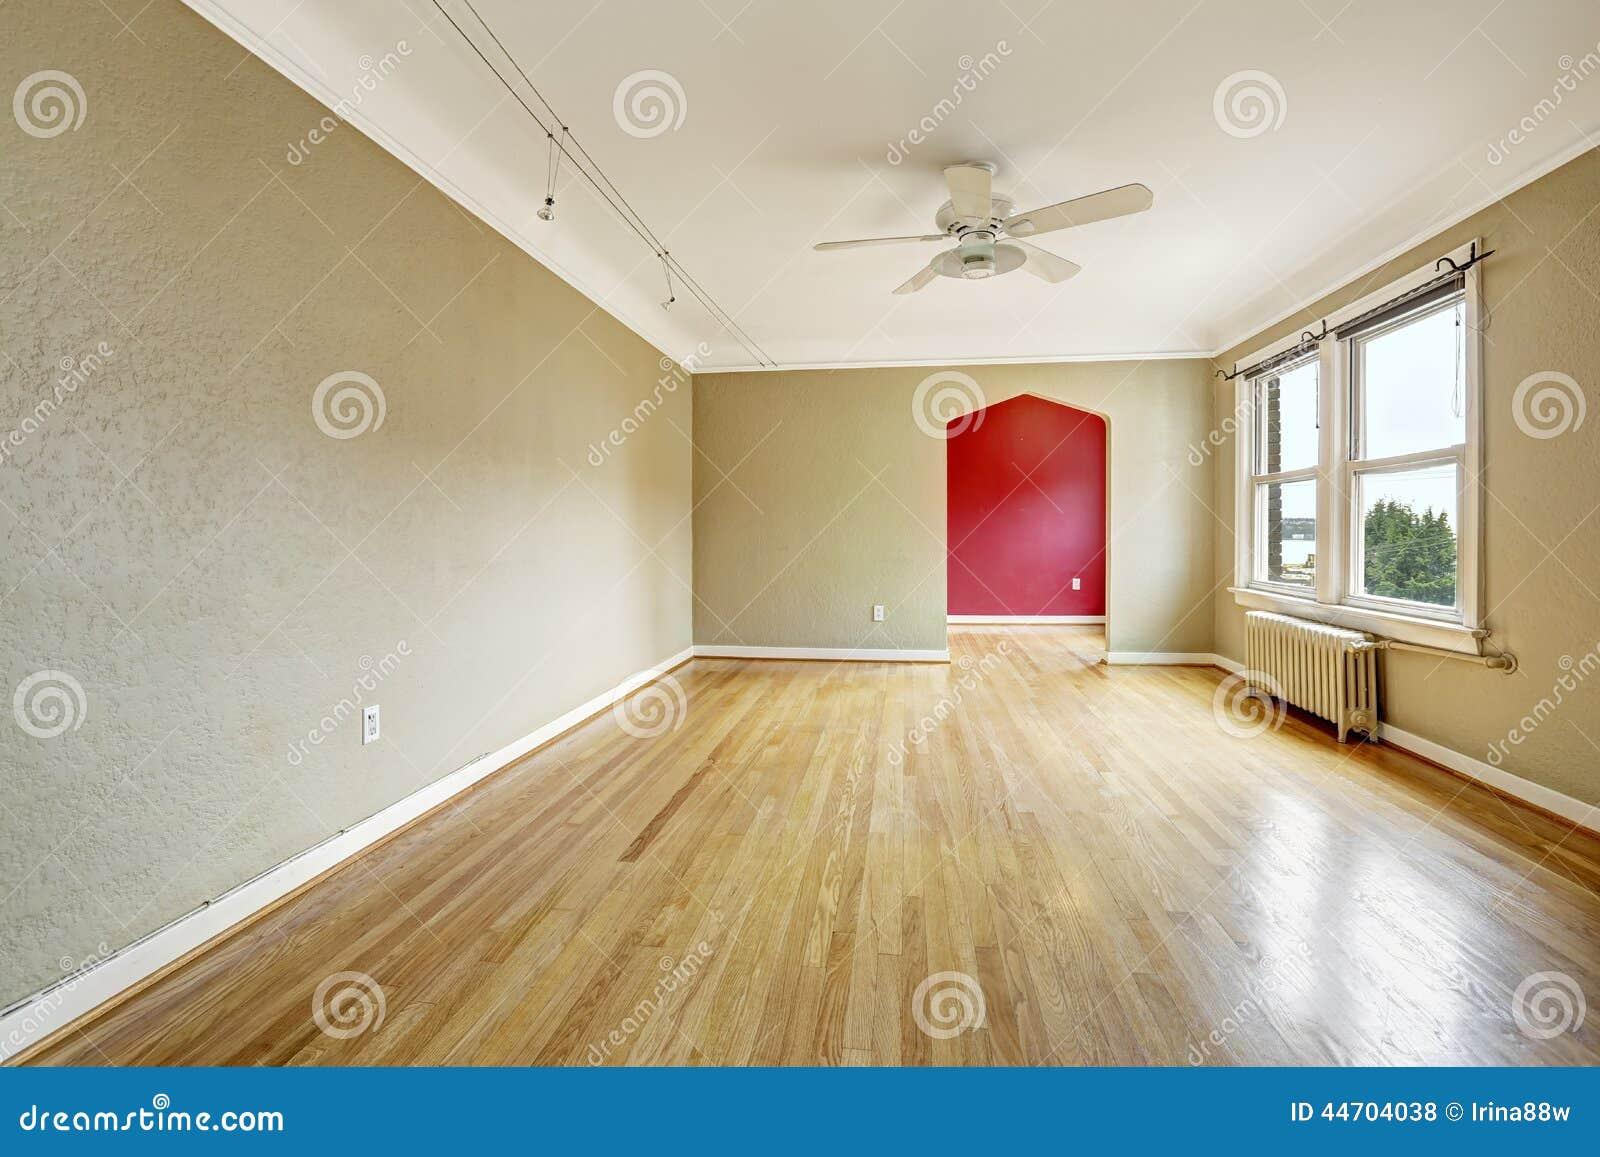 old radiator royalty free stock image 7633678. Black Bedroom Furniture Sets. Home Design Ideas